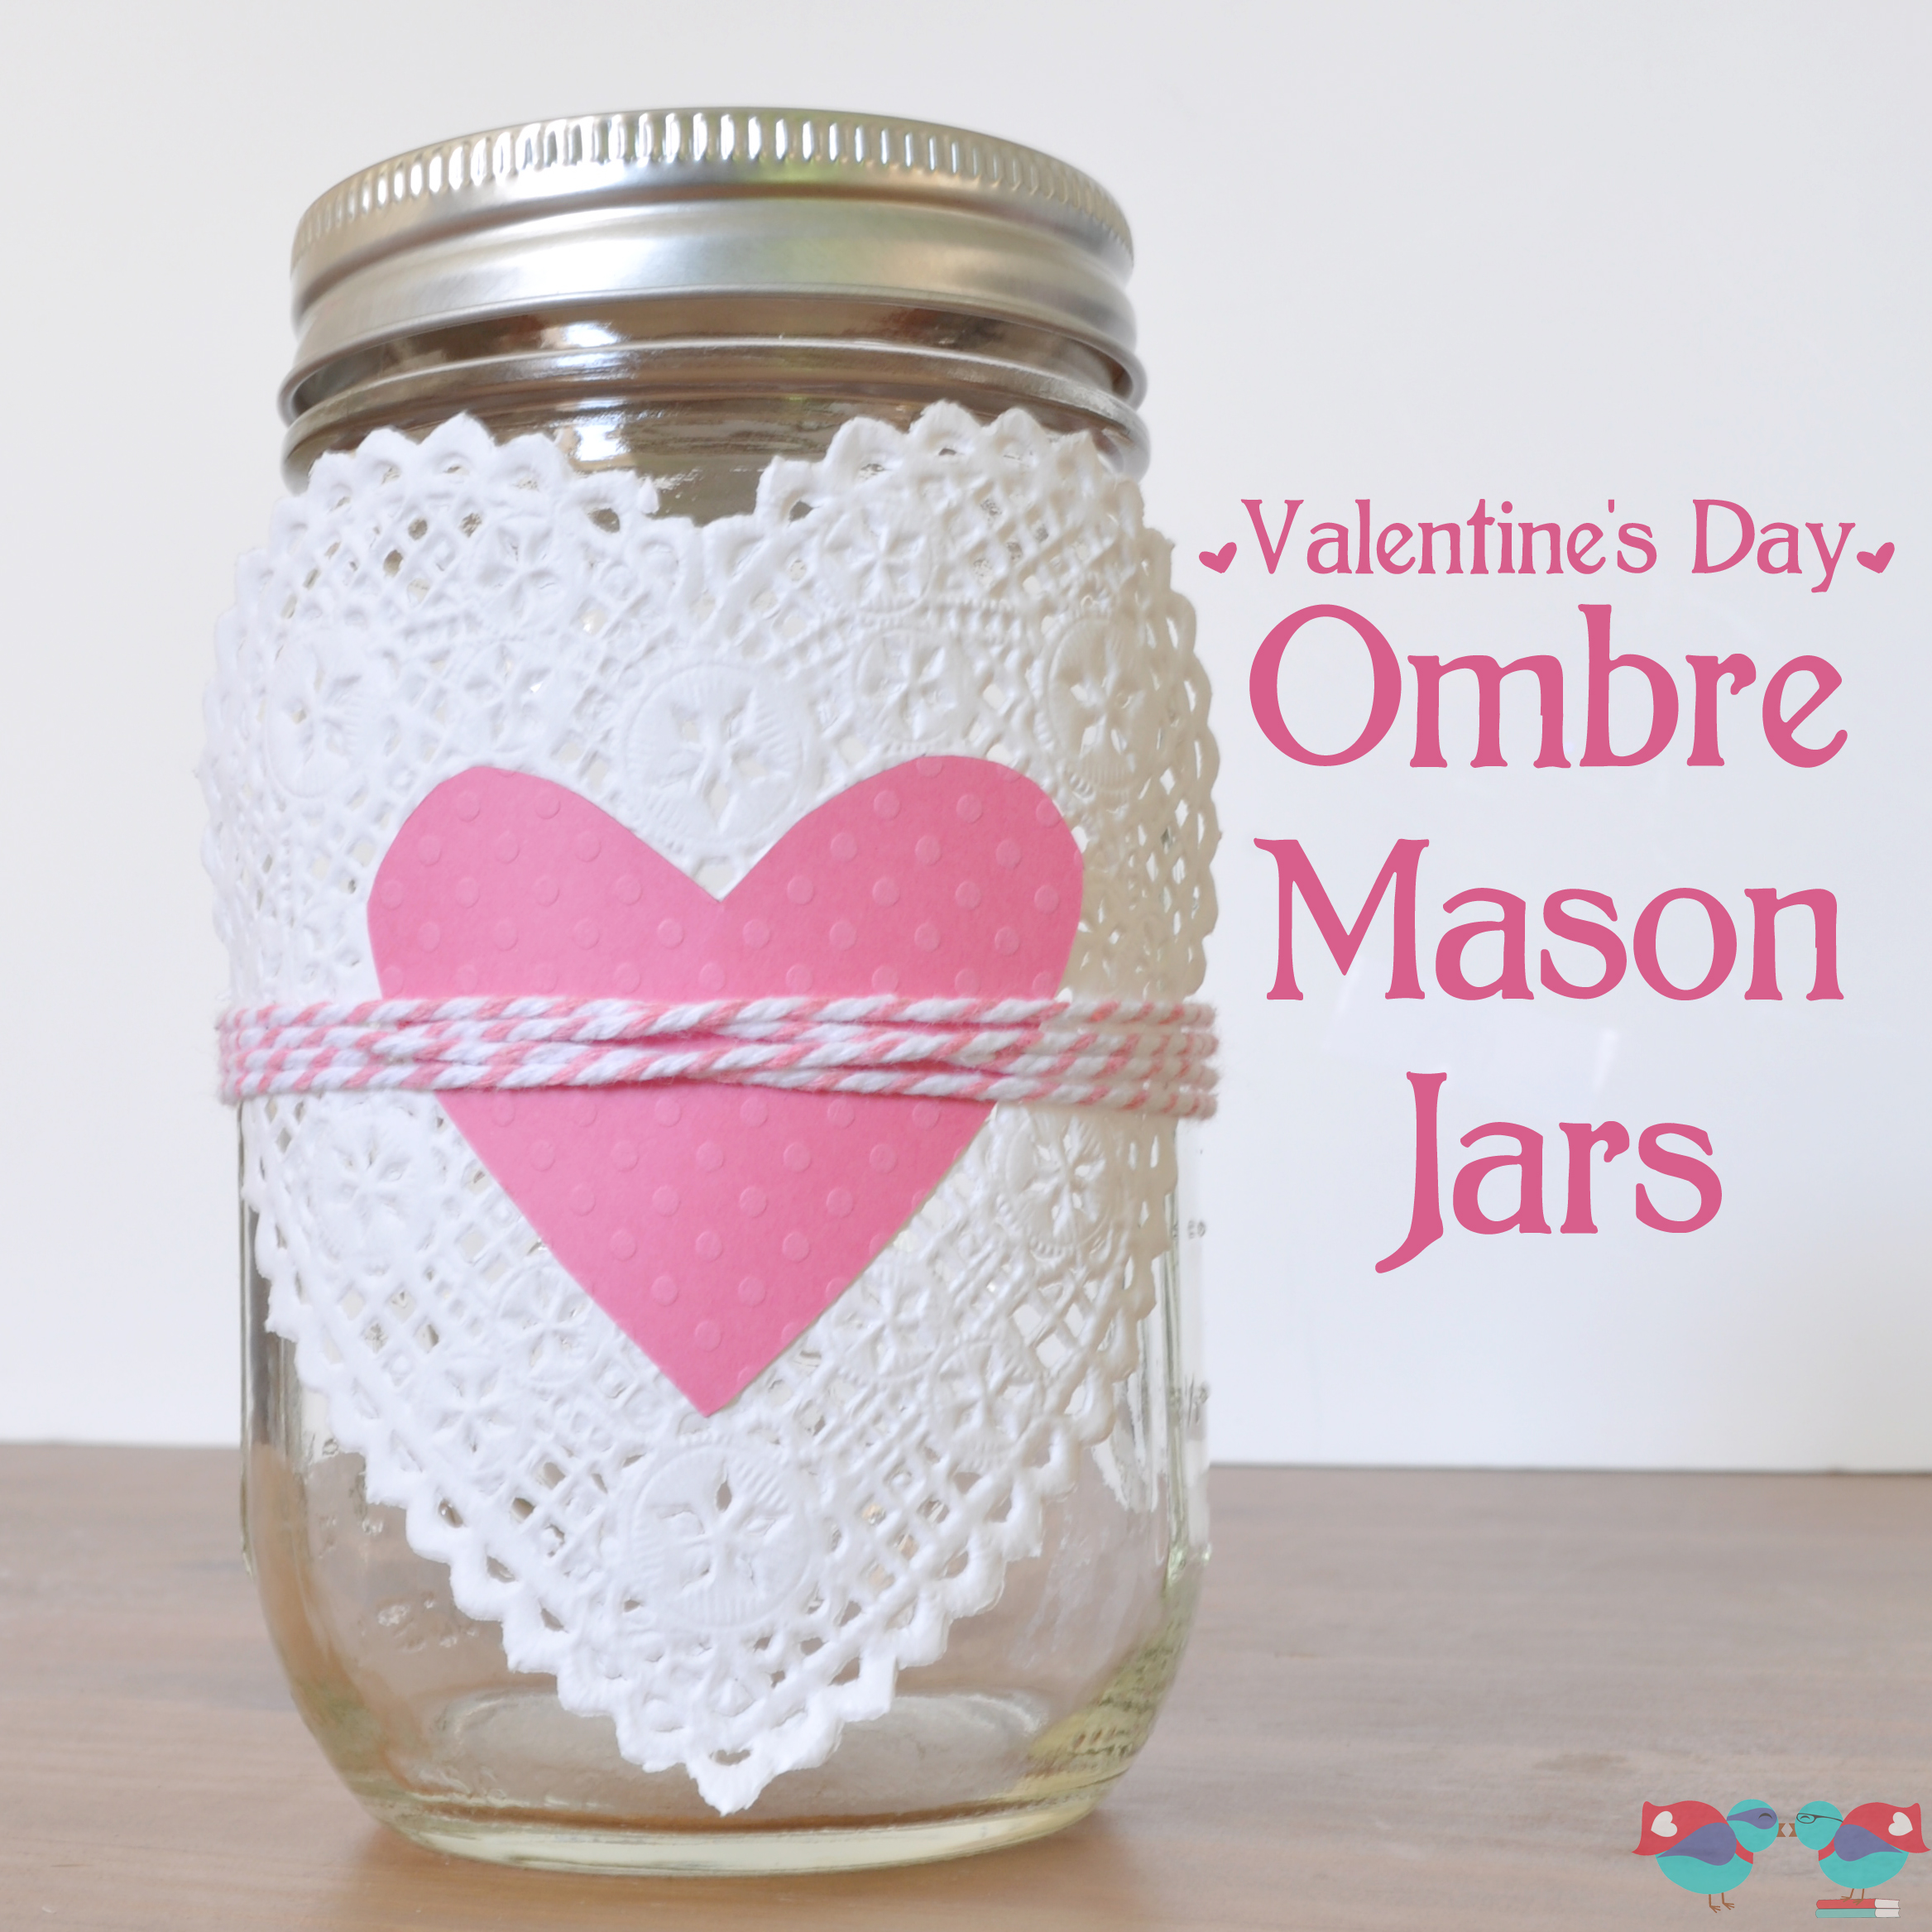 Lovely ombre heart mason jars the love nerds for Mason jar crafts love